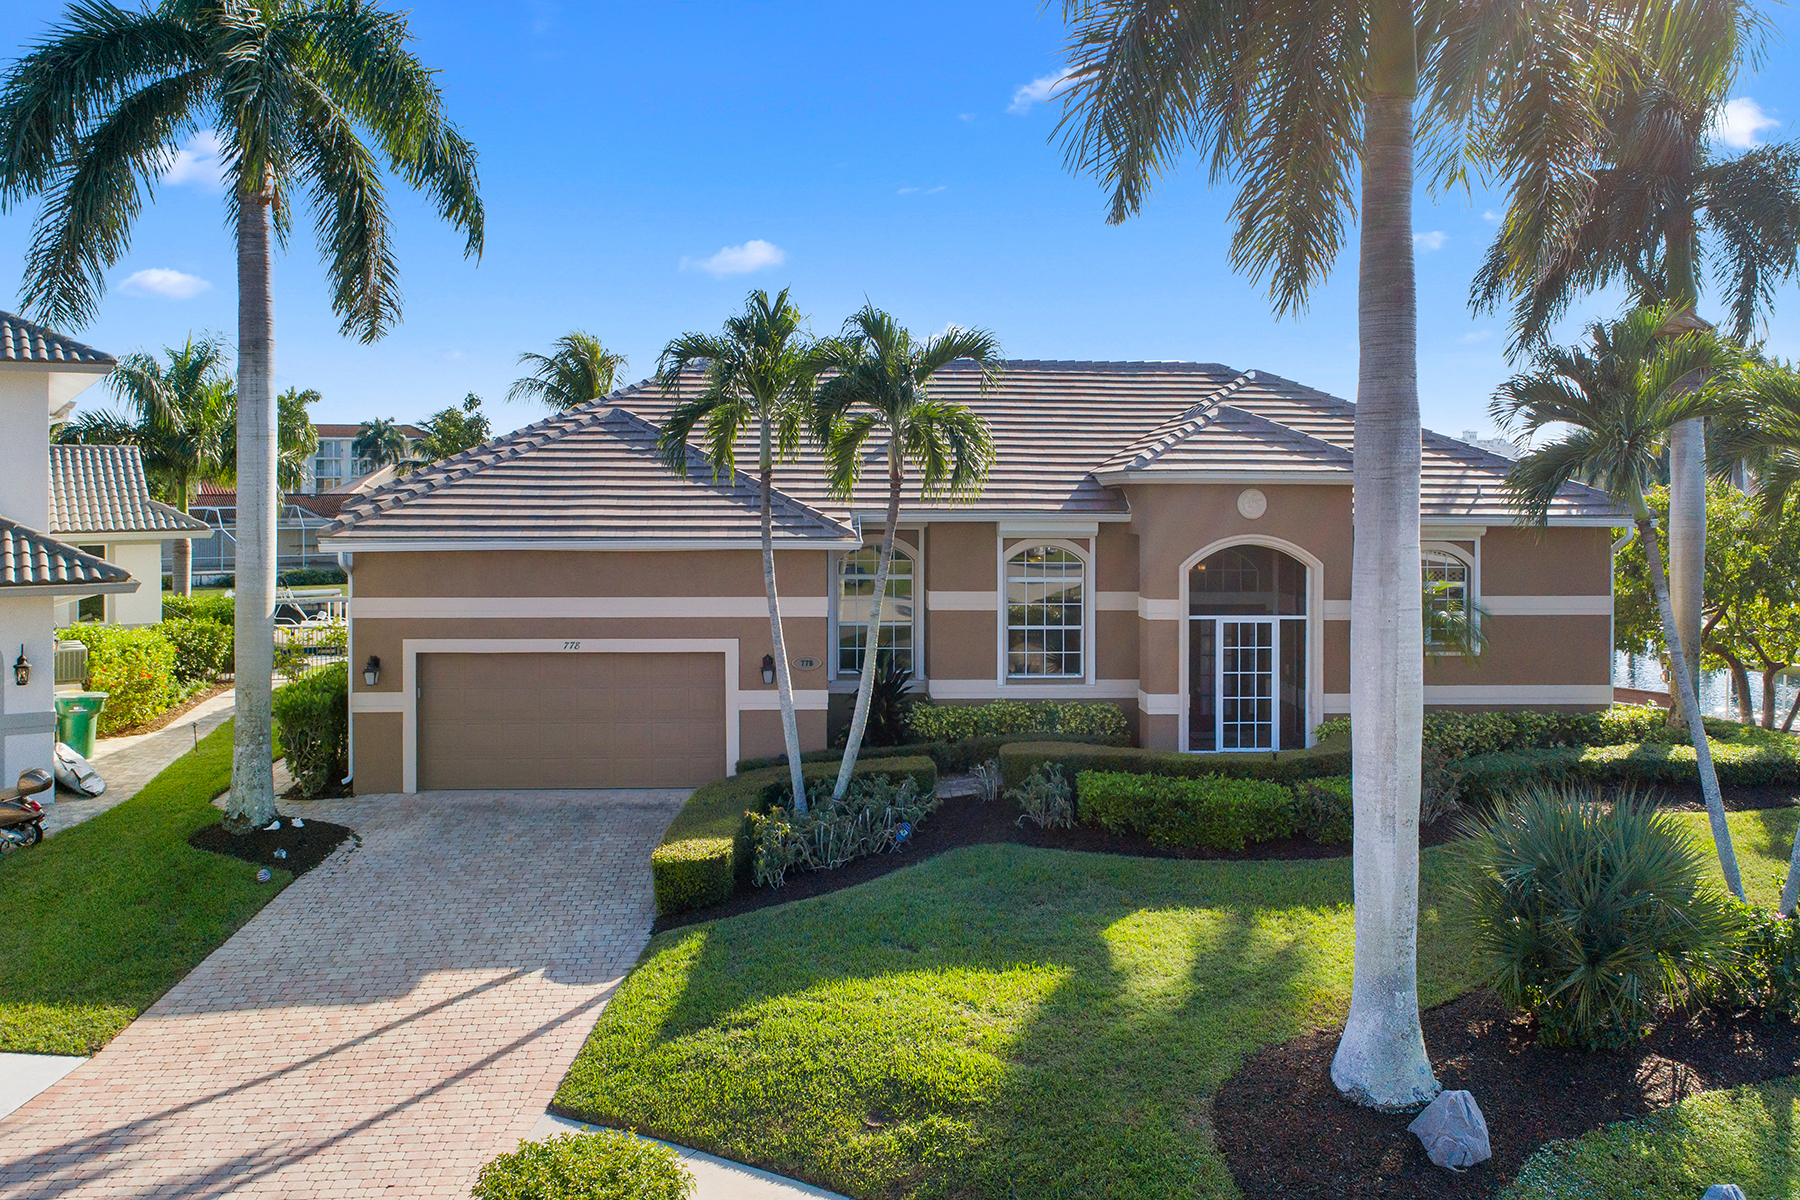 Single Family Homes 为 销售 在 MARCO ISLAND 778 Pelican Court 马可岛, 佛罗里达州 34145 美国